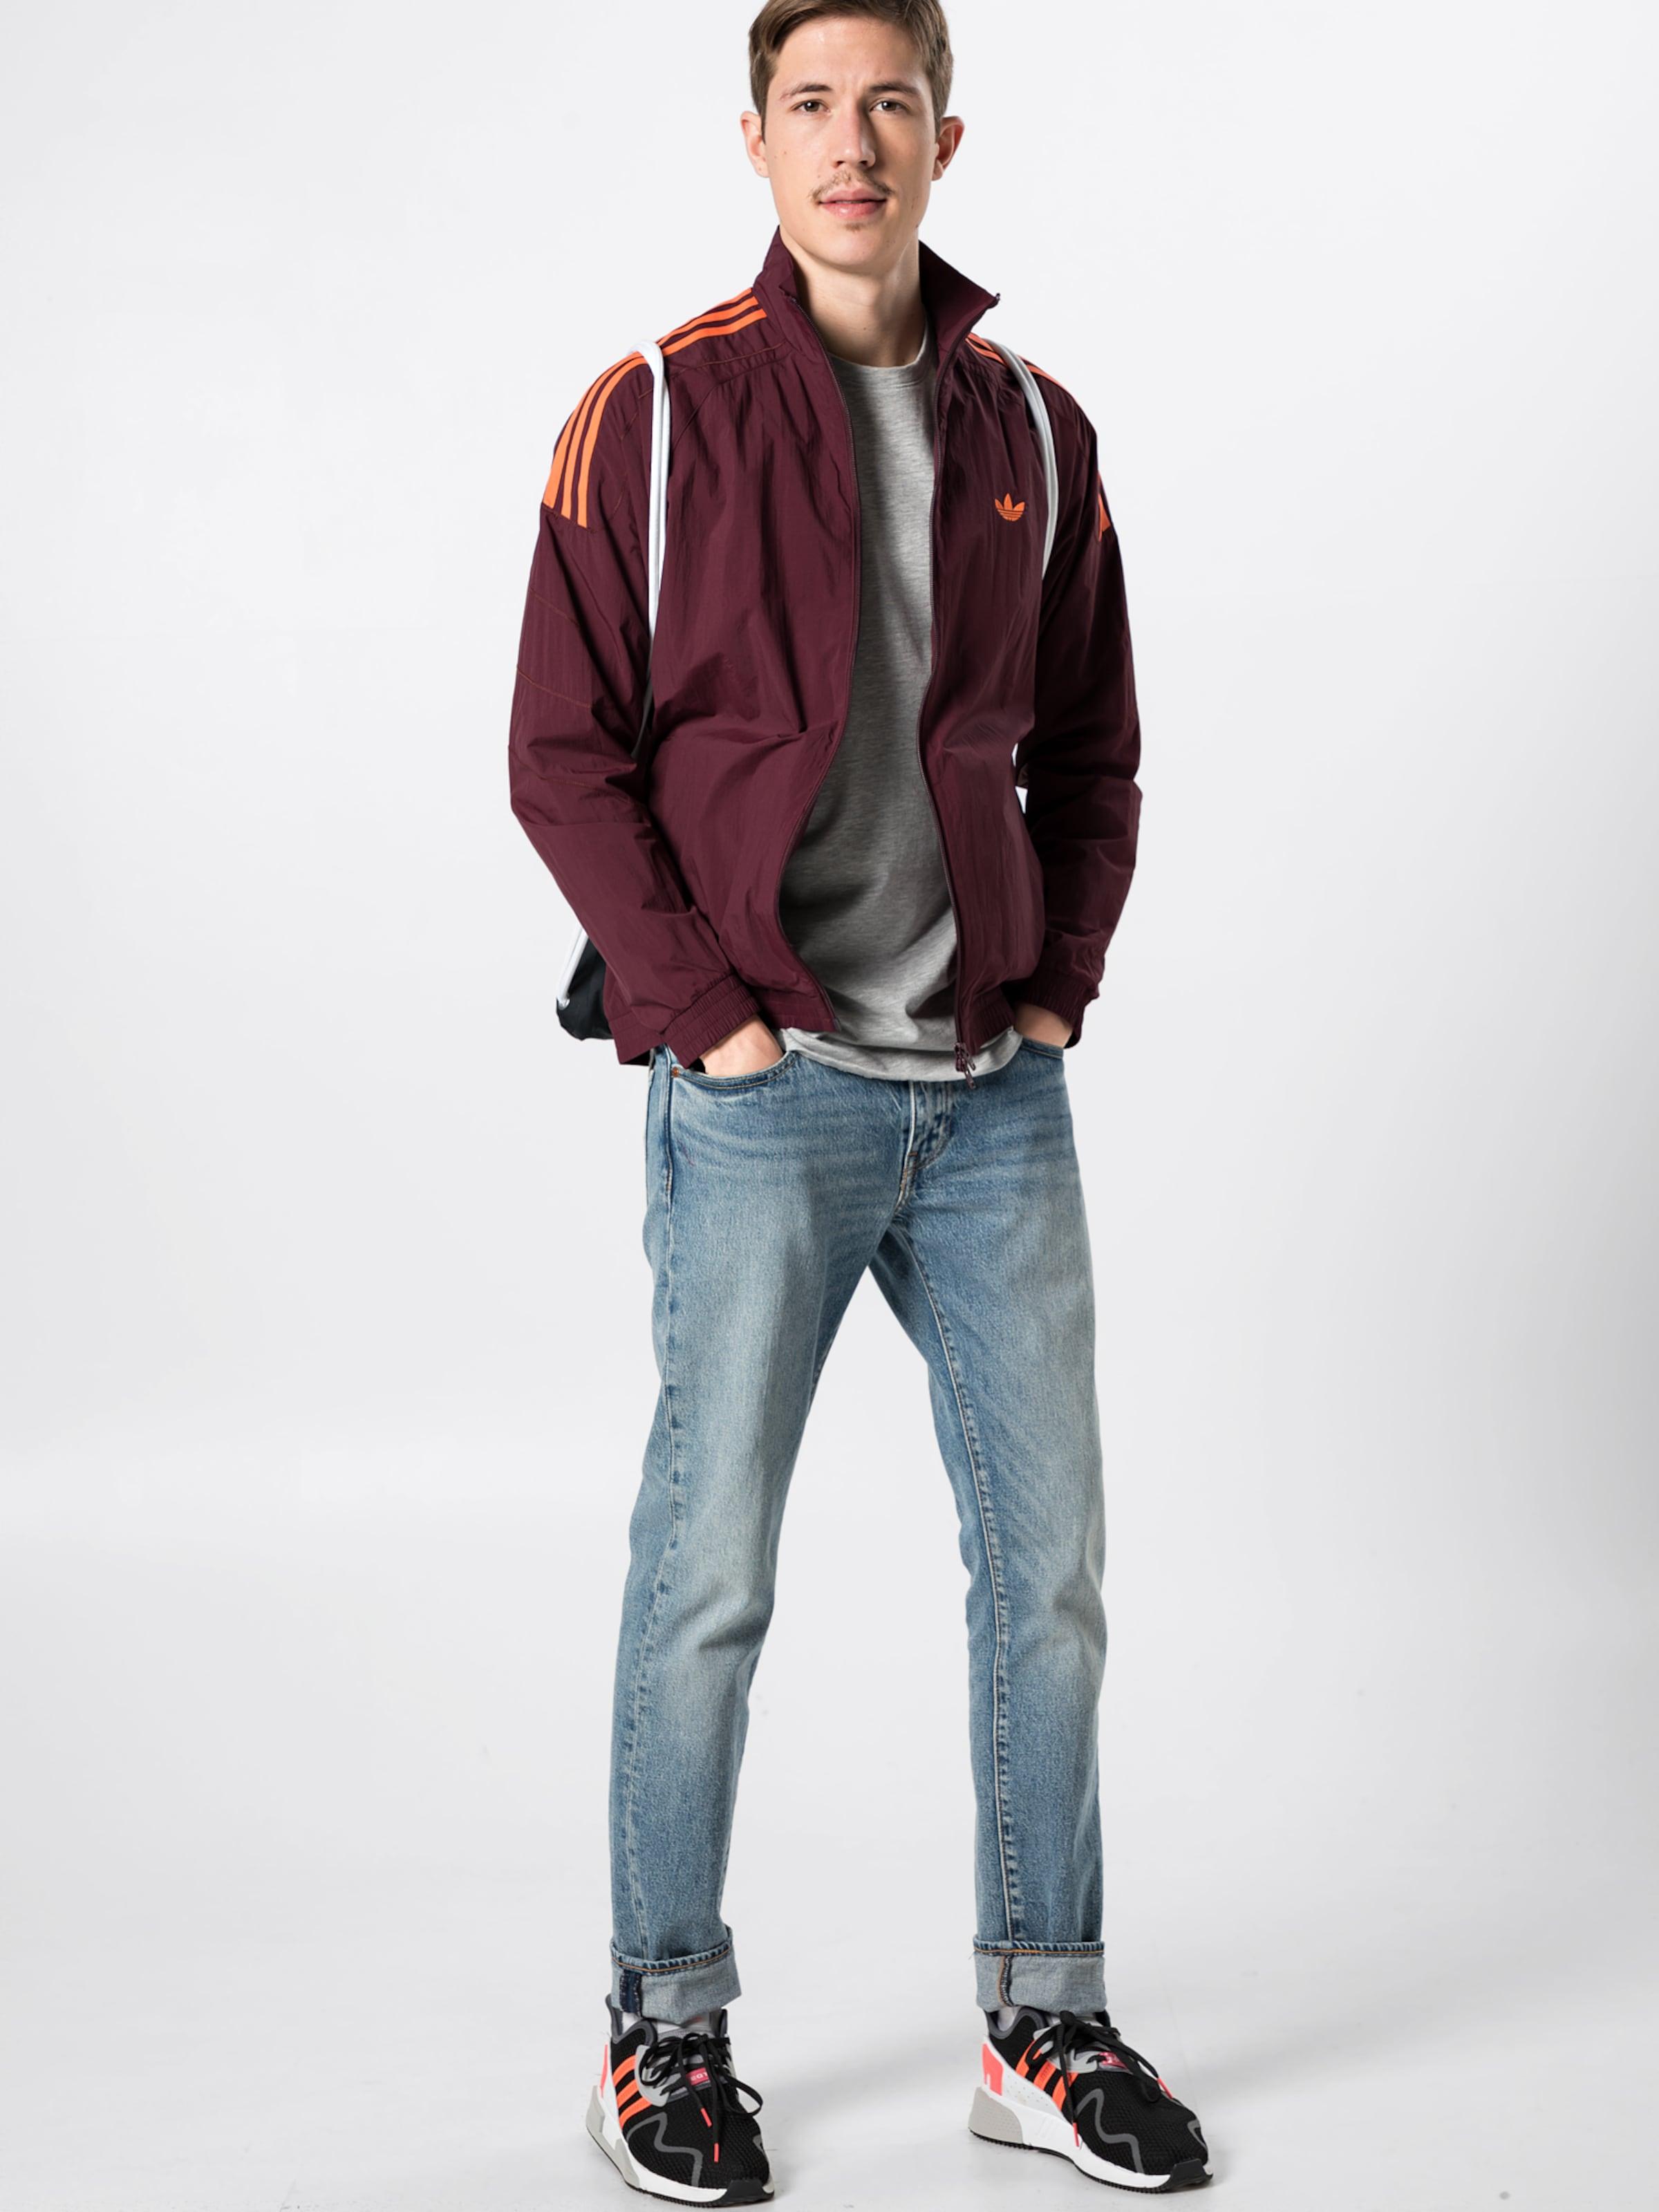 Adidas Burgunder Originals 'flamestrk Wv Tt' In Jacke PkwOZiuTX